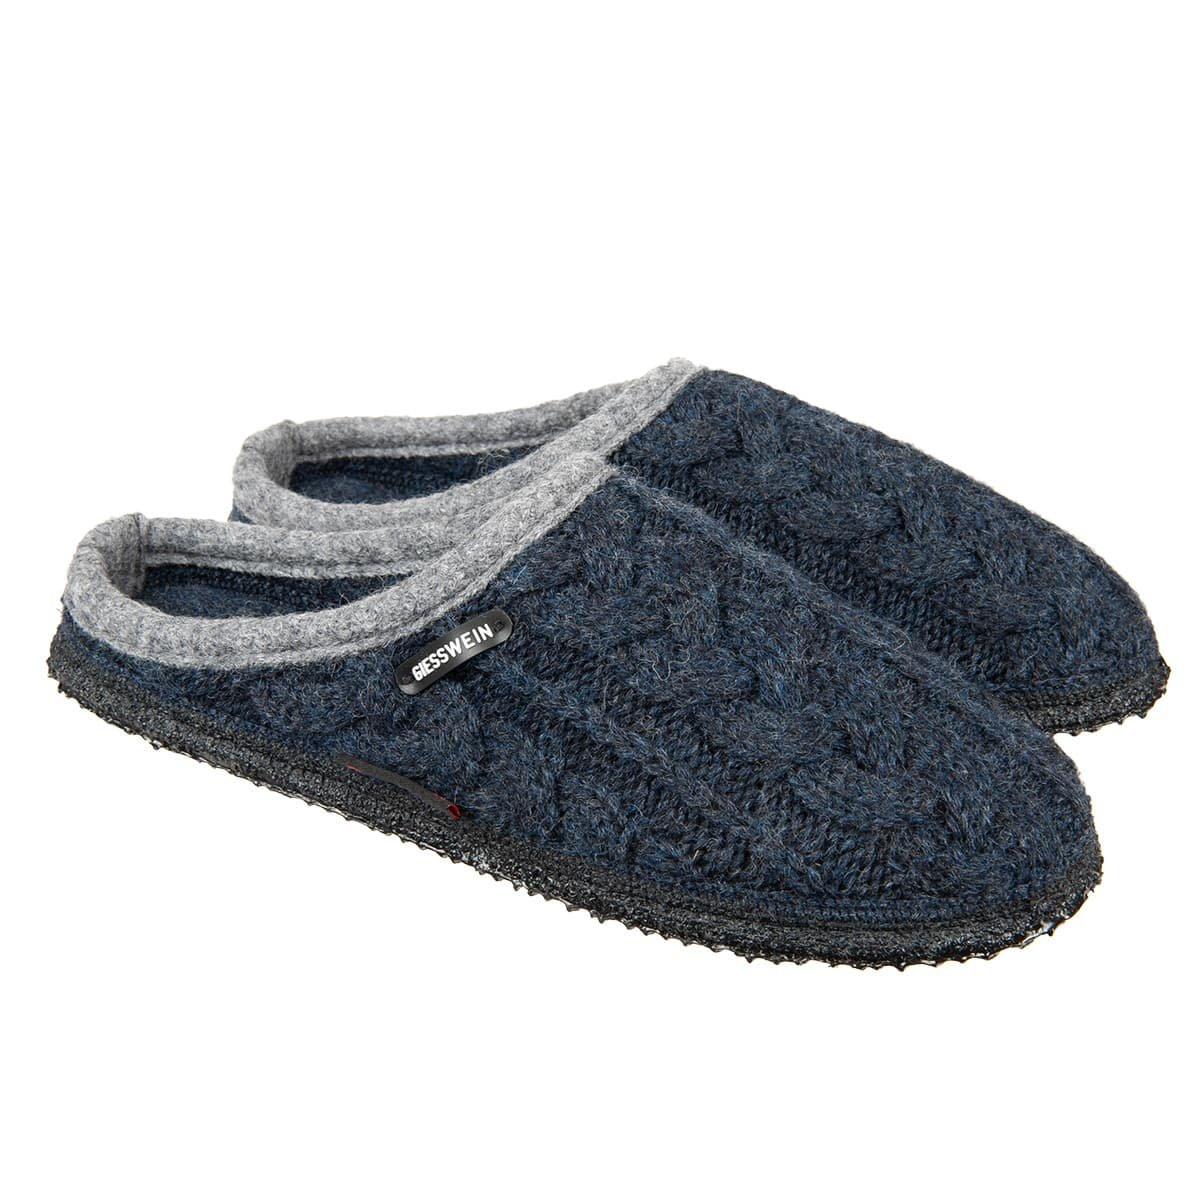 Pantofole firmate Giesswein aperte dietro modello Neudau ... fc33ec3c7c2a